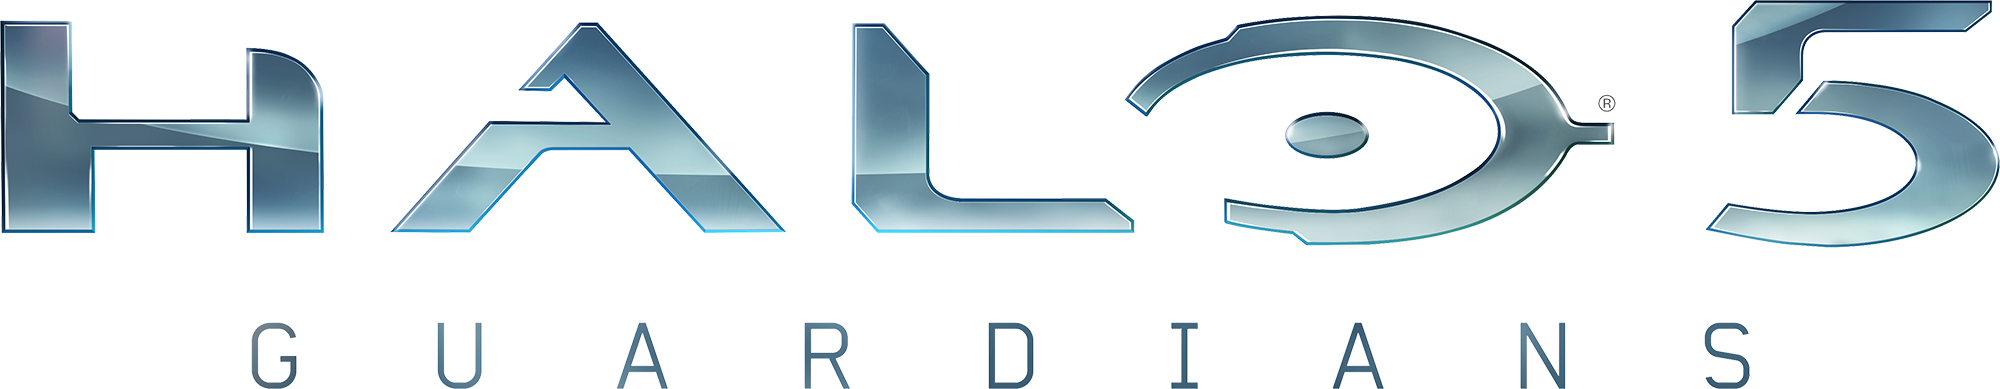 Halo 5 Logos.